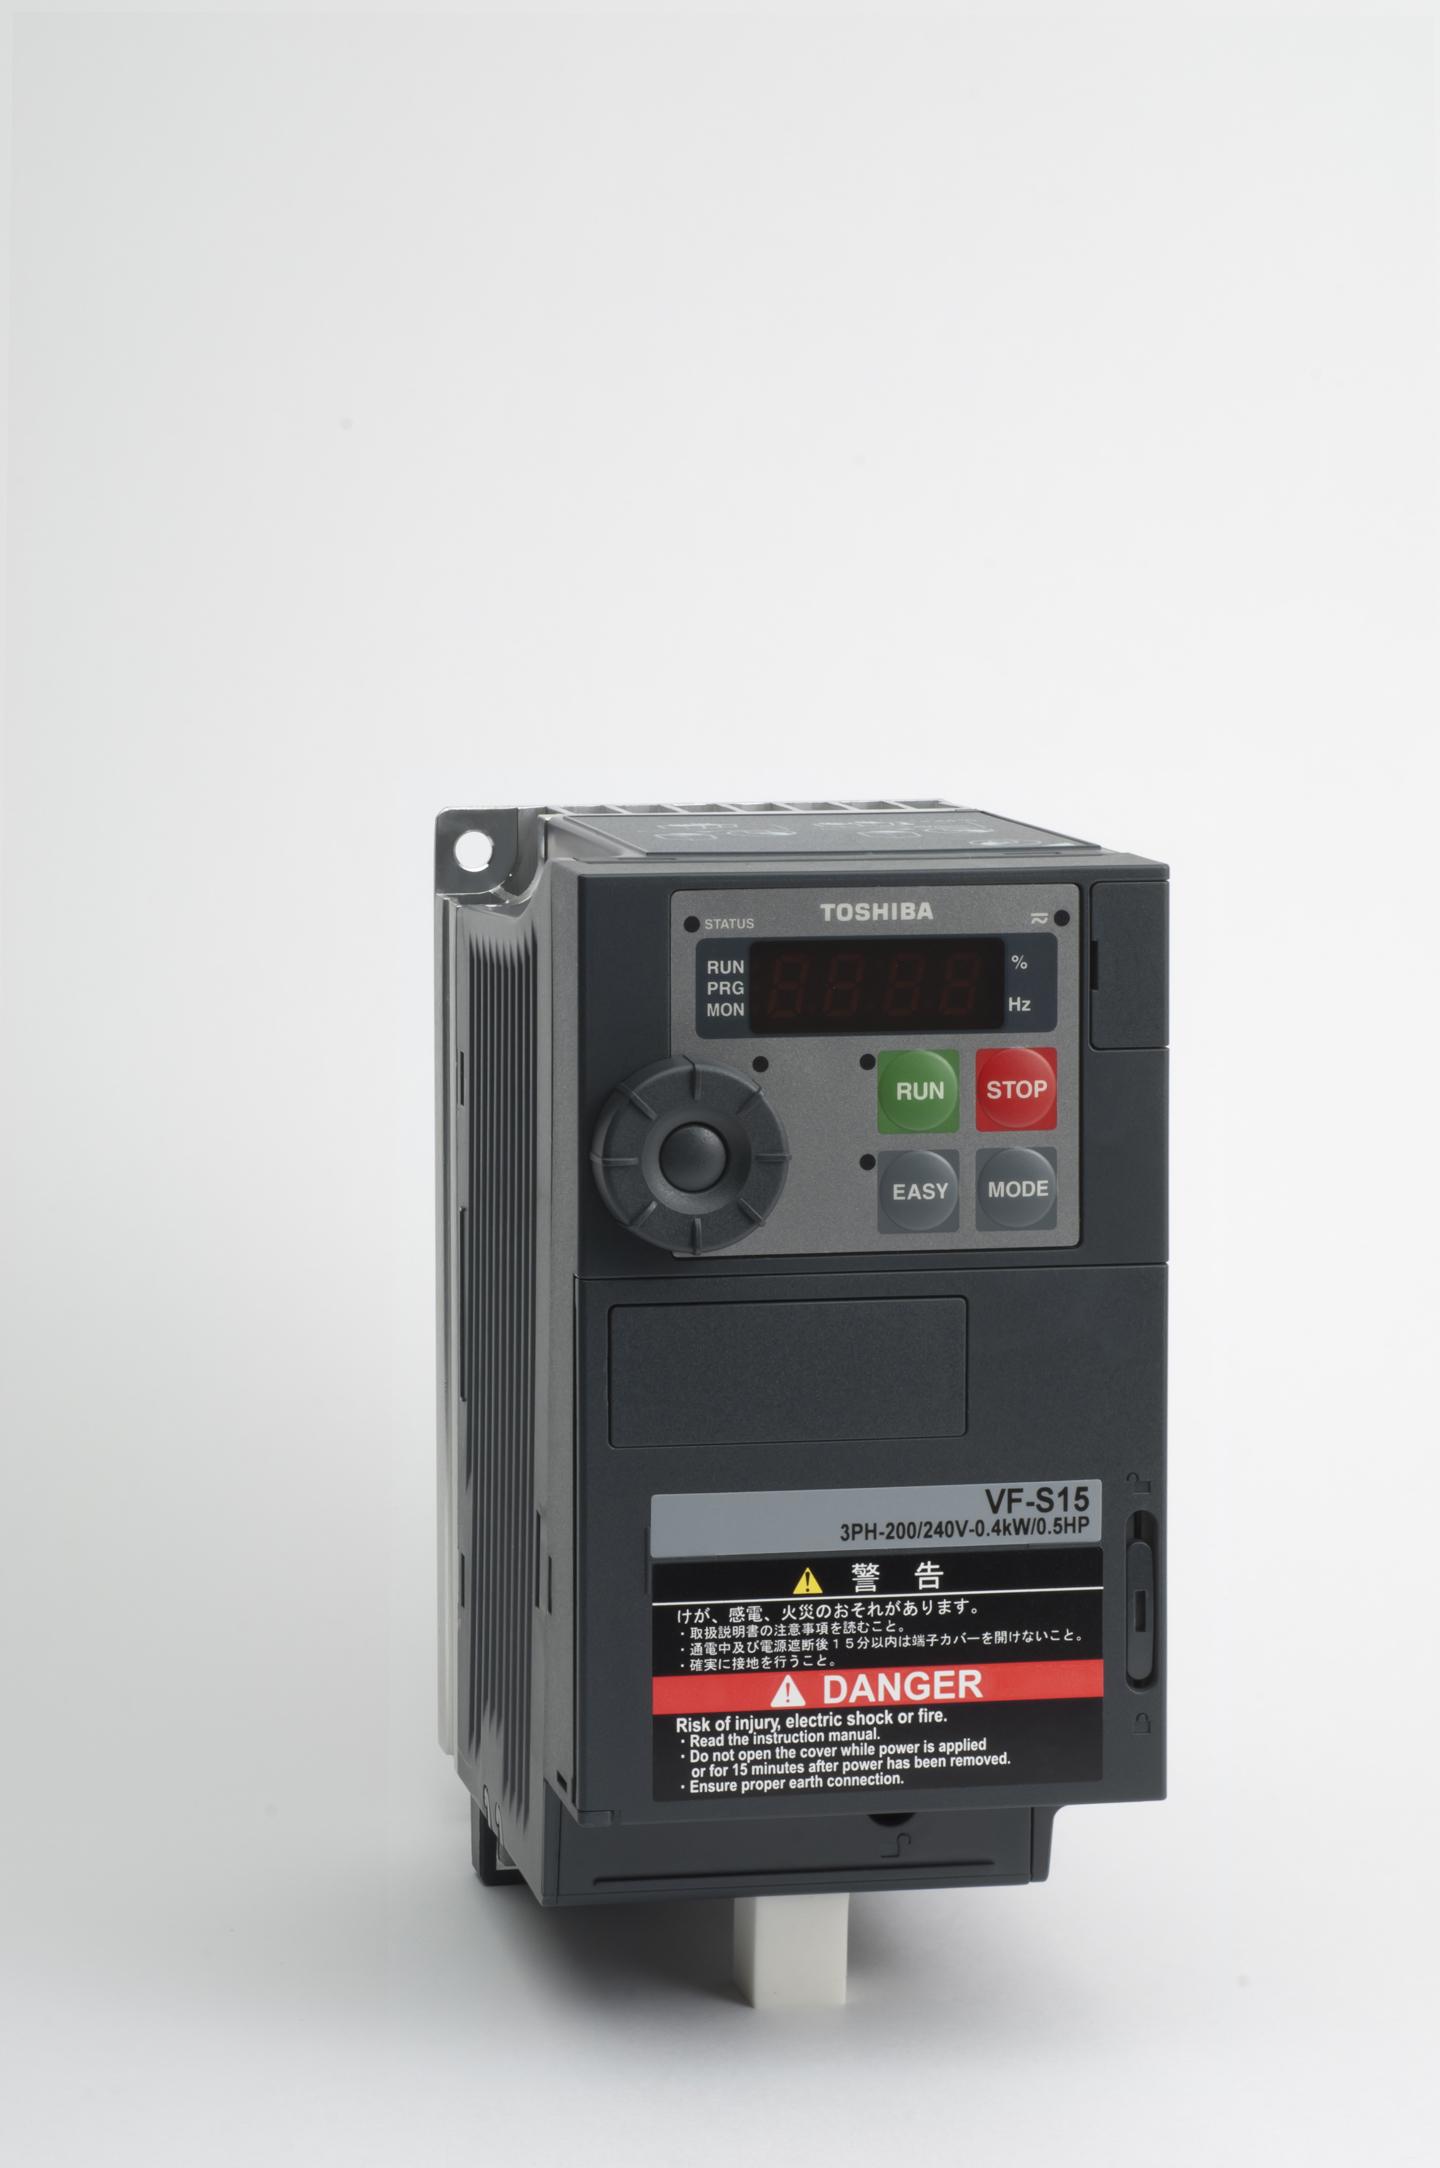 ezgo voltage regulator test free ford logo yamaha g9 wiring diagram alternator vacuum auto